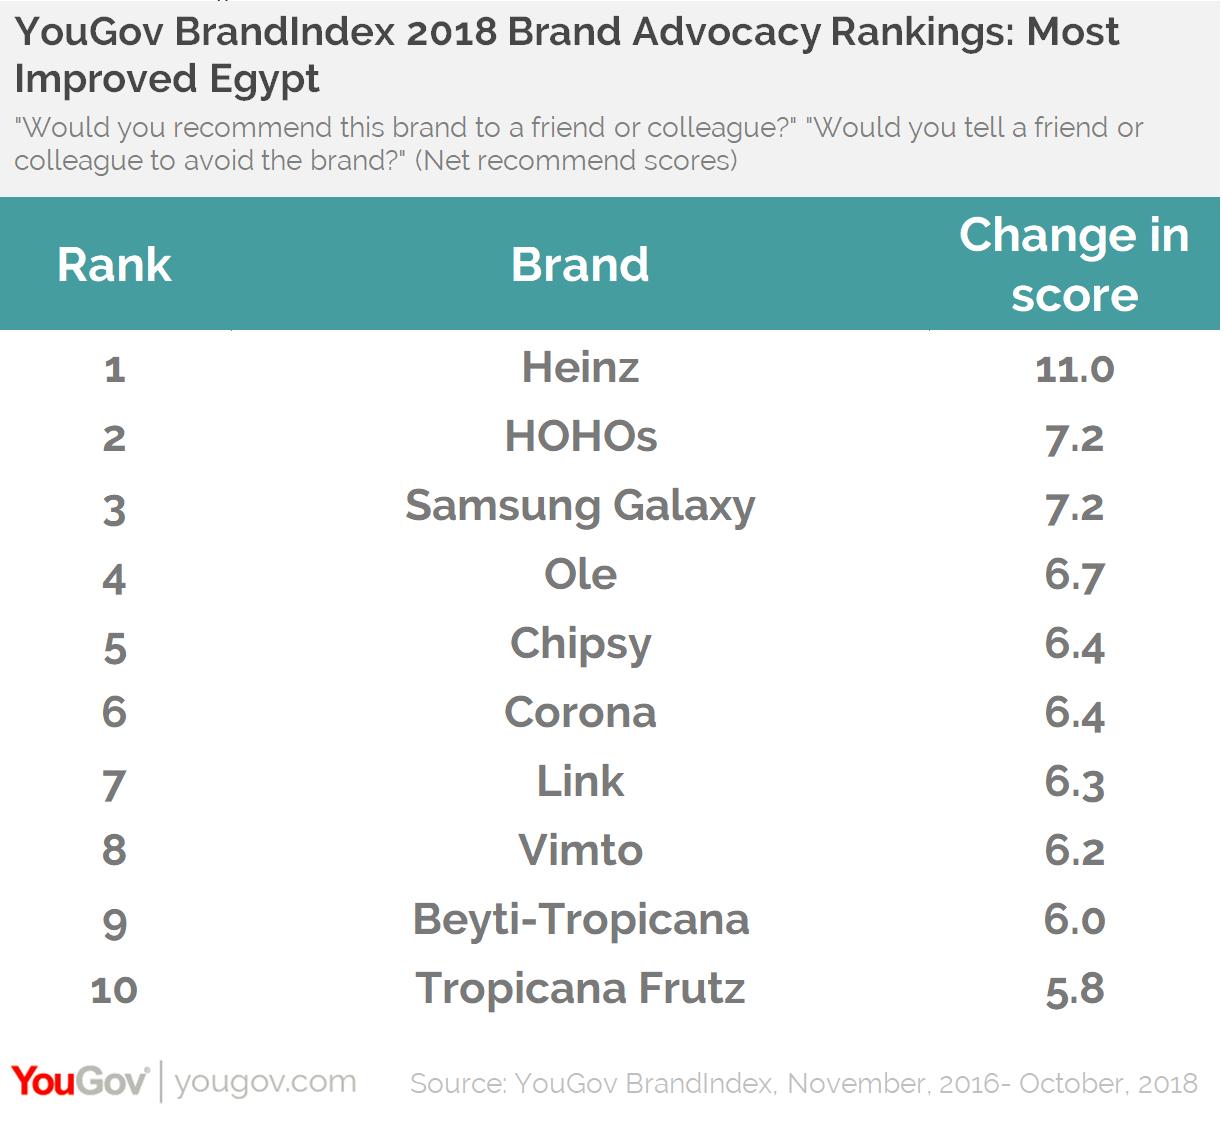 YouGov BrandIndex 2018 Brand Advocacy Rankings:Most improved Egypt